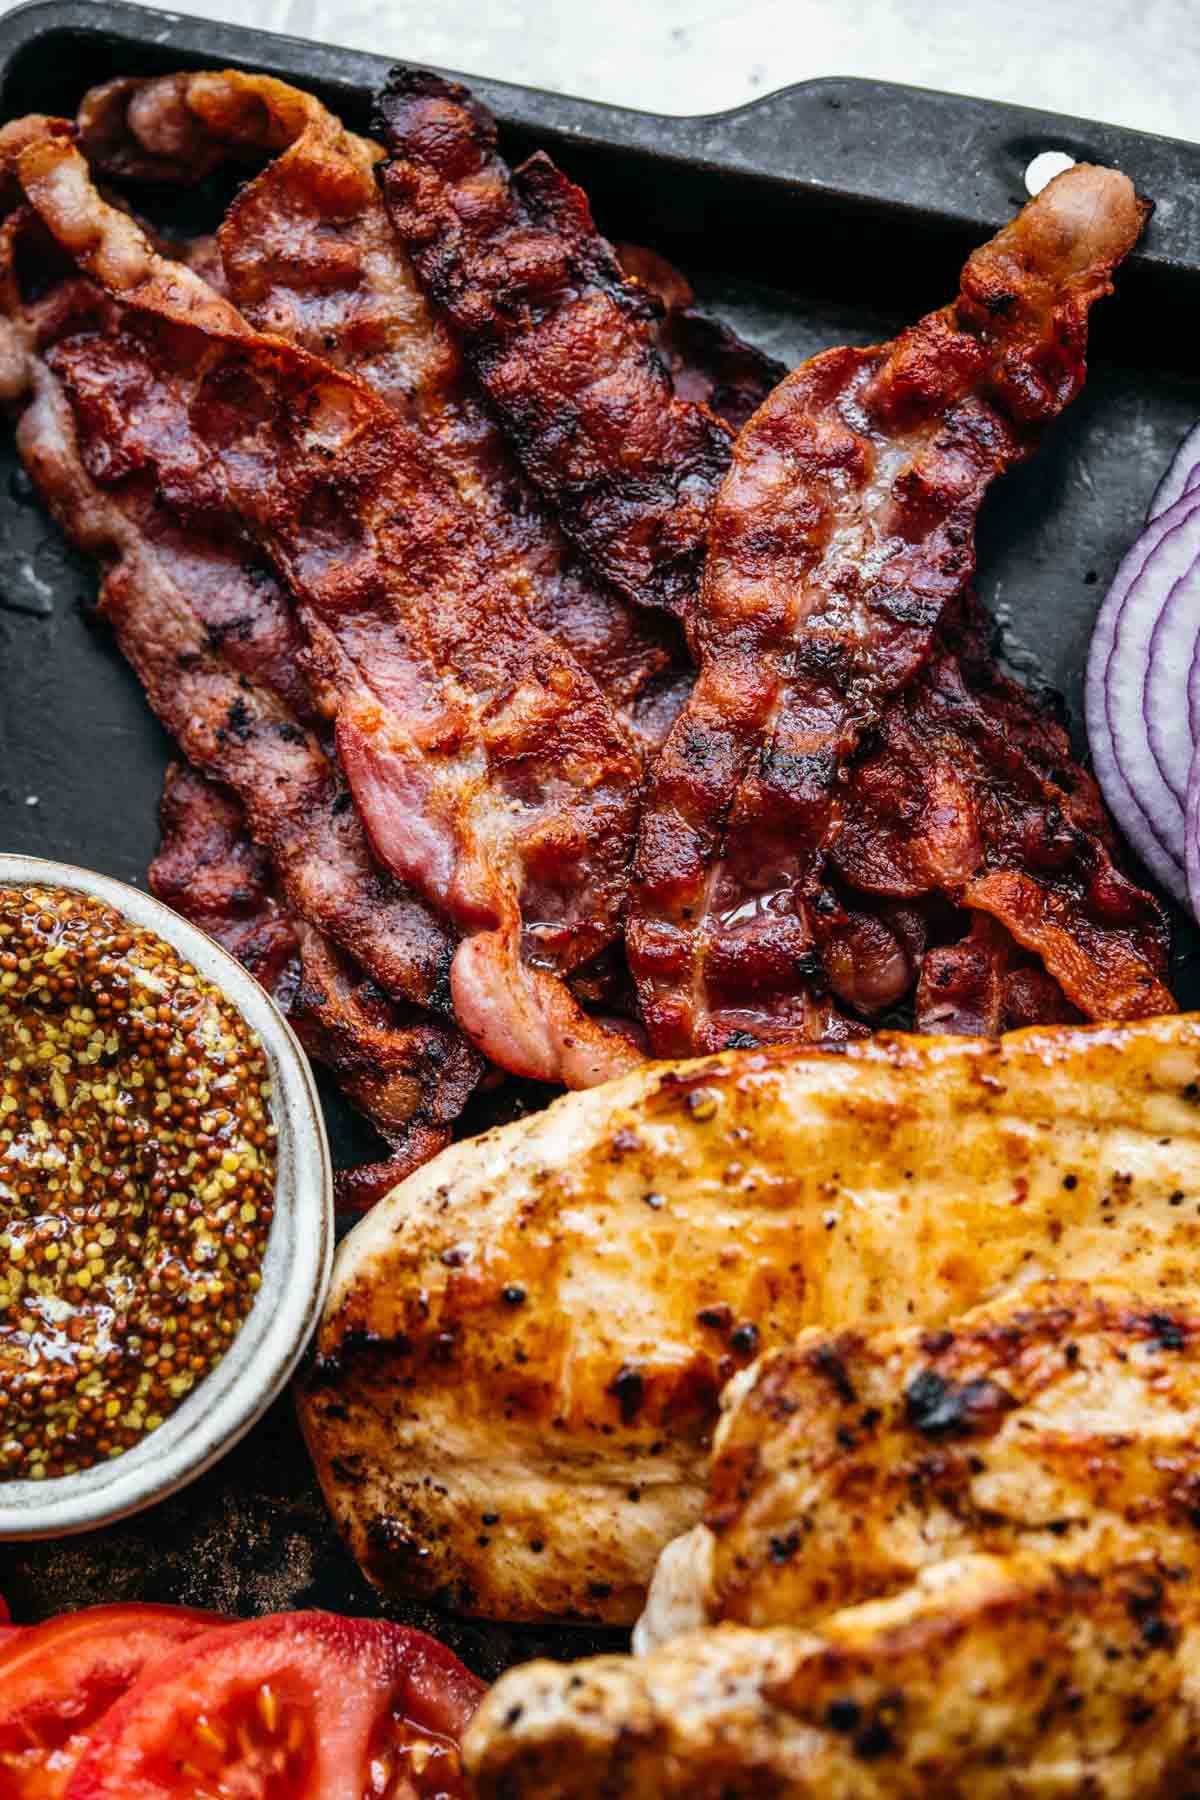 Grilled Chicken, bacon, and ground mustard for Grilled Chicken Sandwich